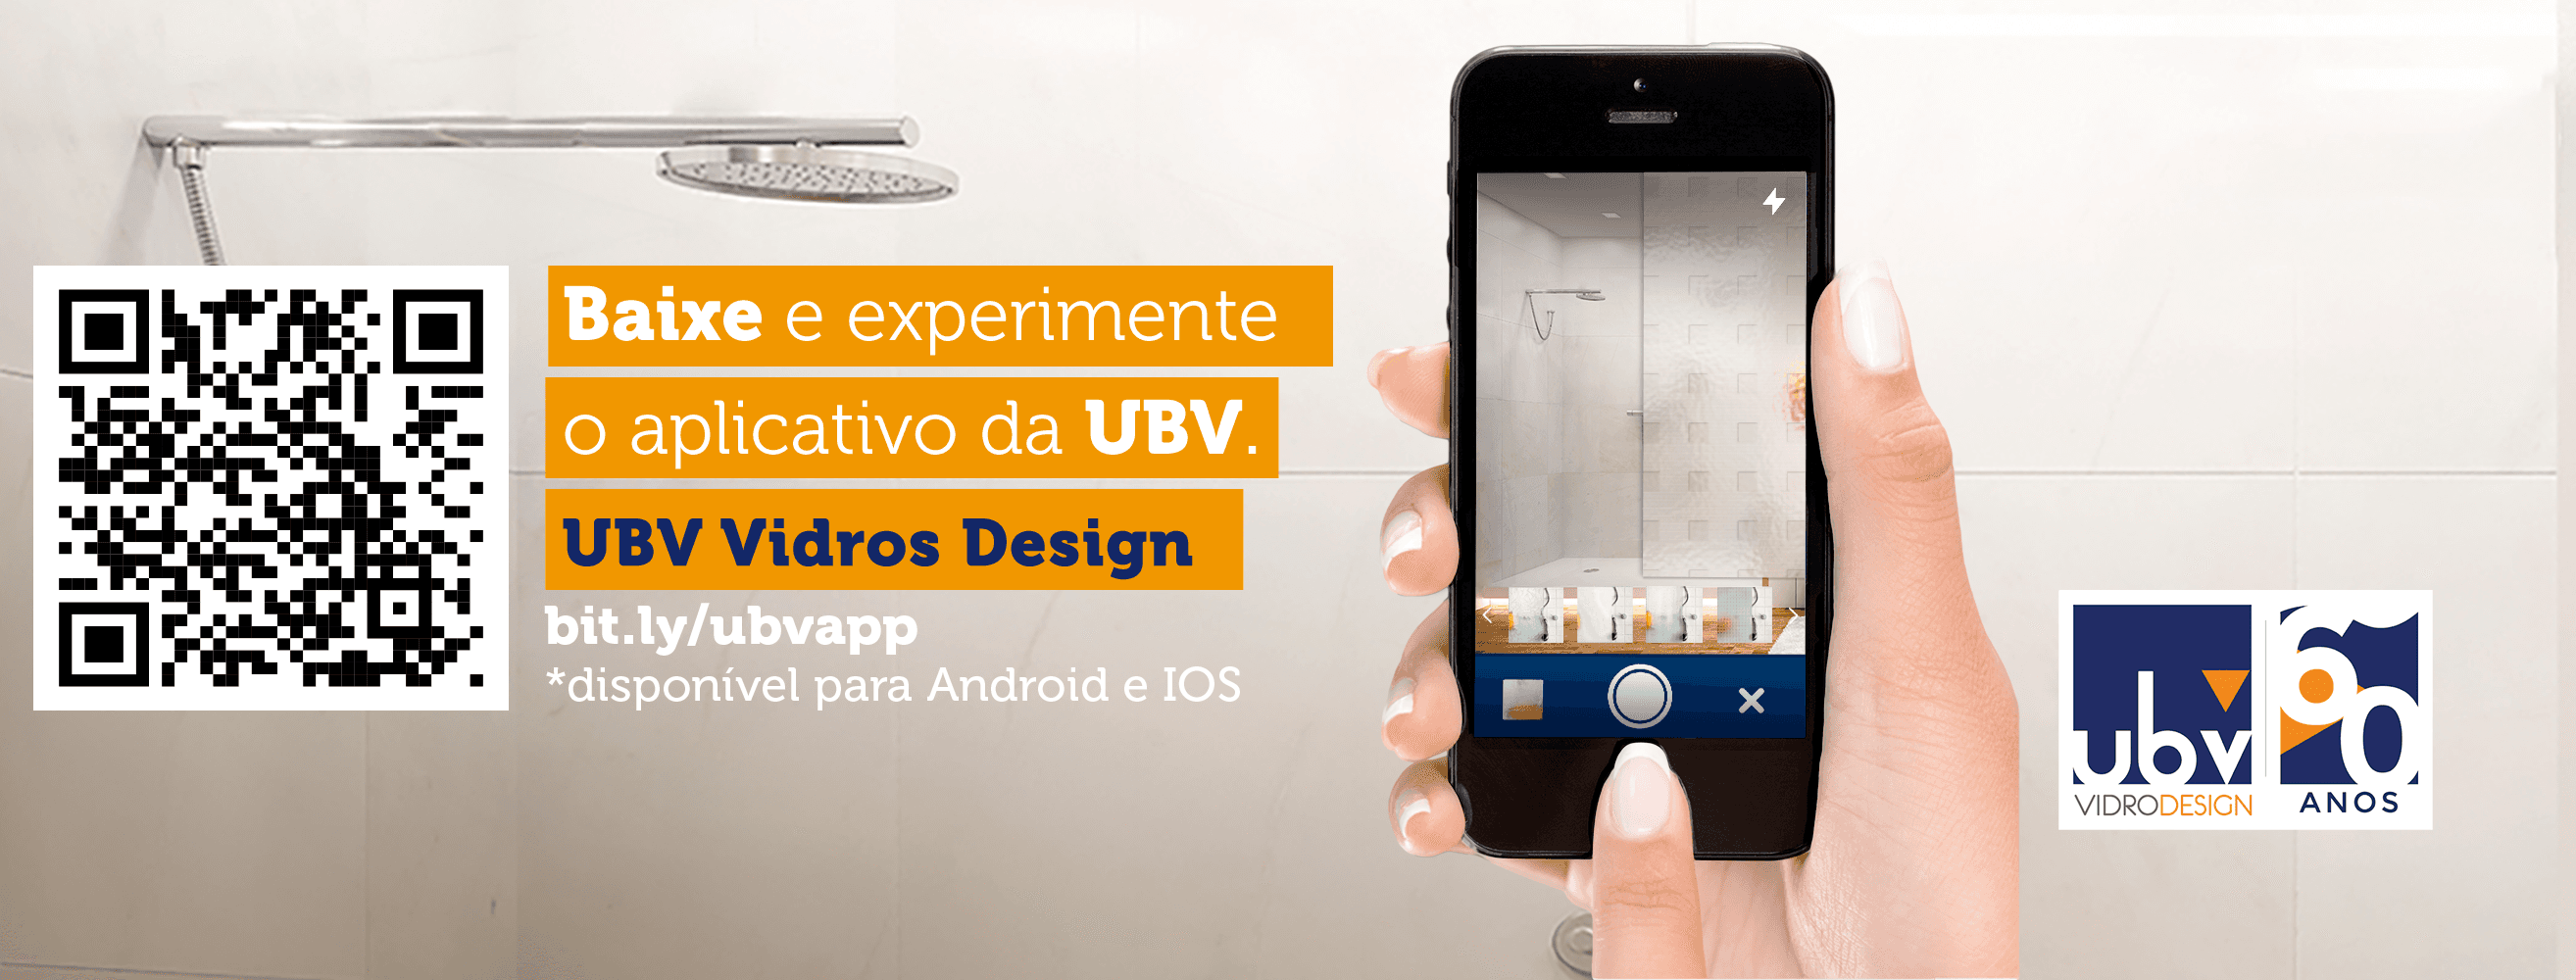 Aplicativo UBV